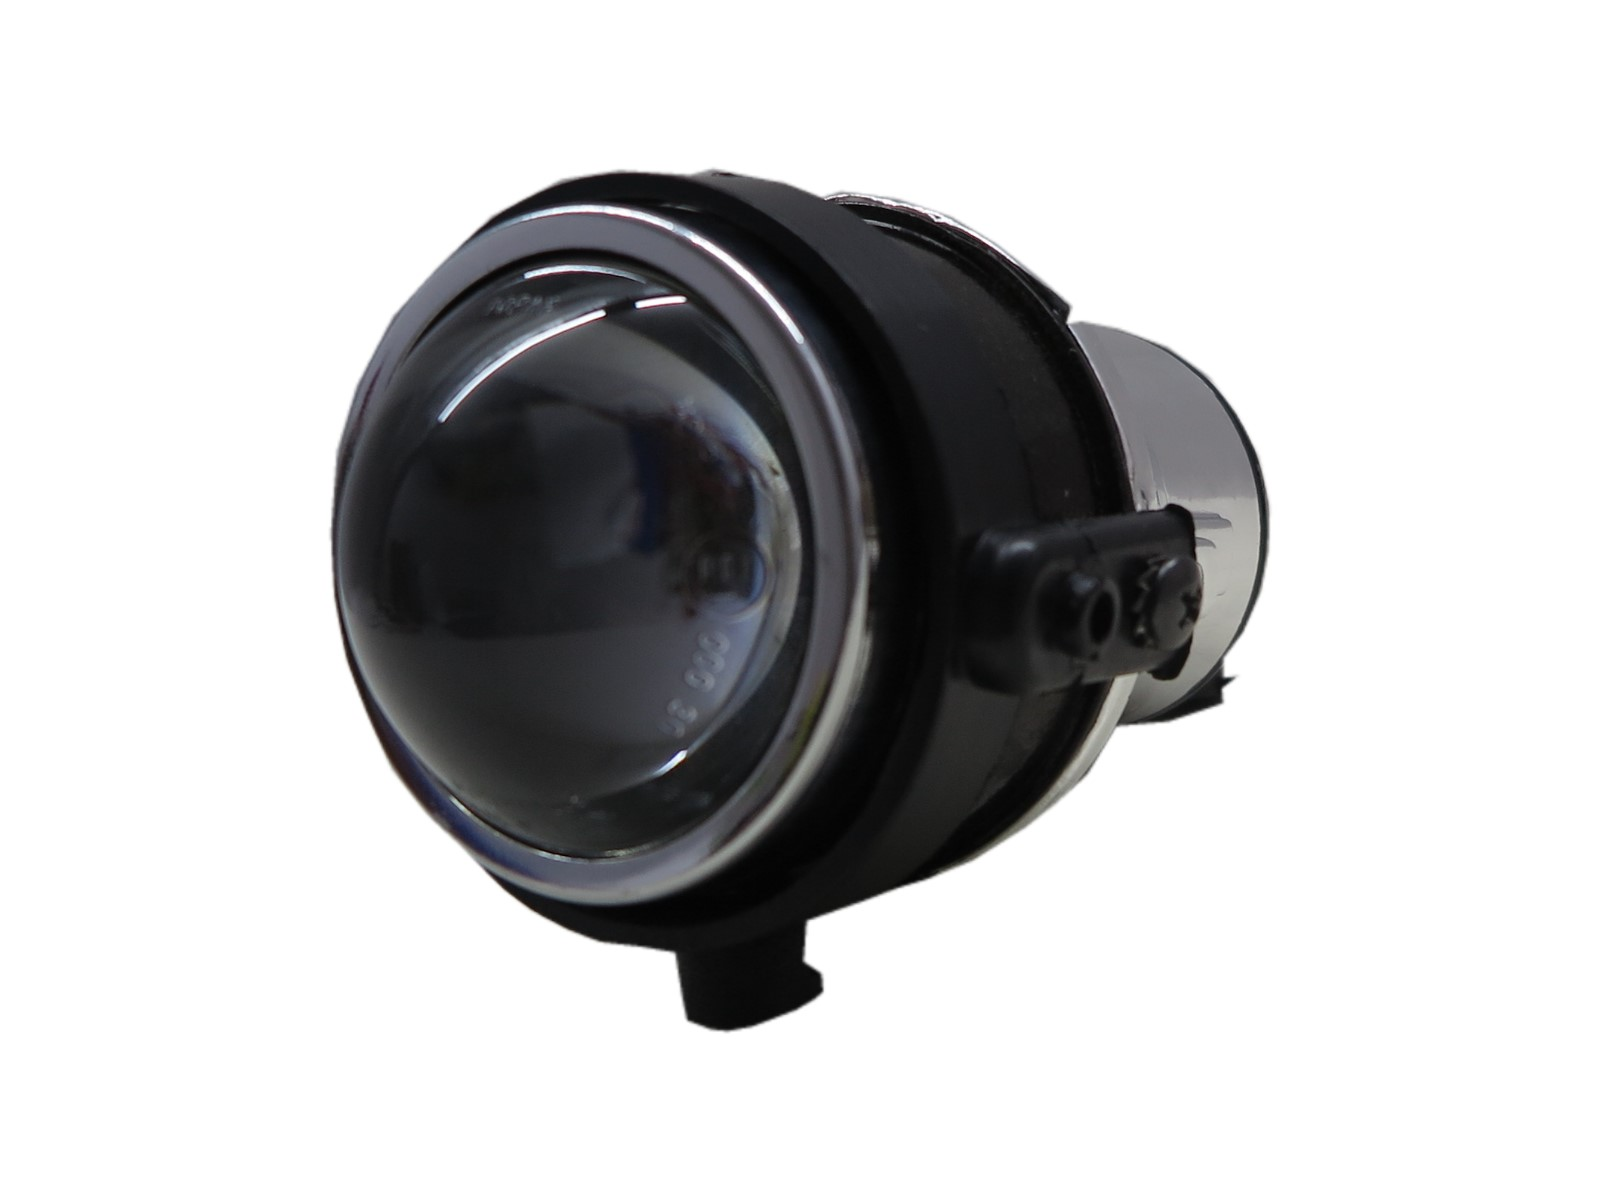 thumbnail 2 - MAZDA5 CREW/CR3W MK2 2012-Present Minivan 5D Projector Fog Light Black for MAZDA